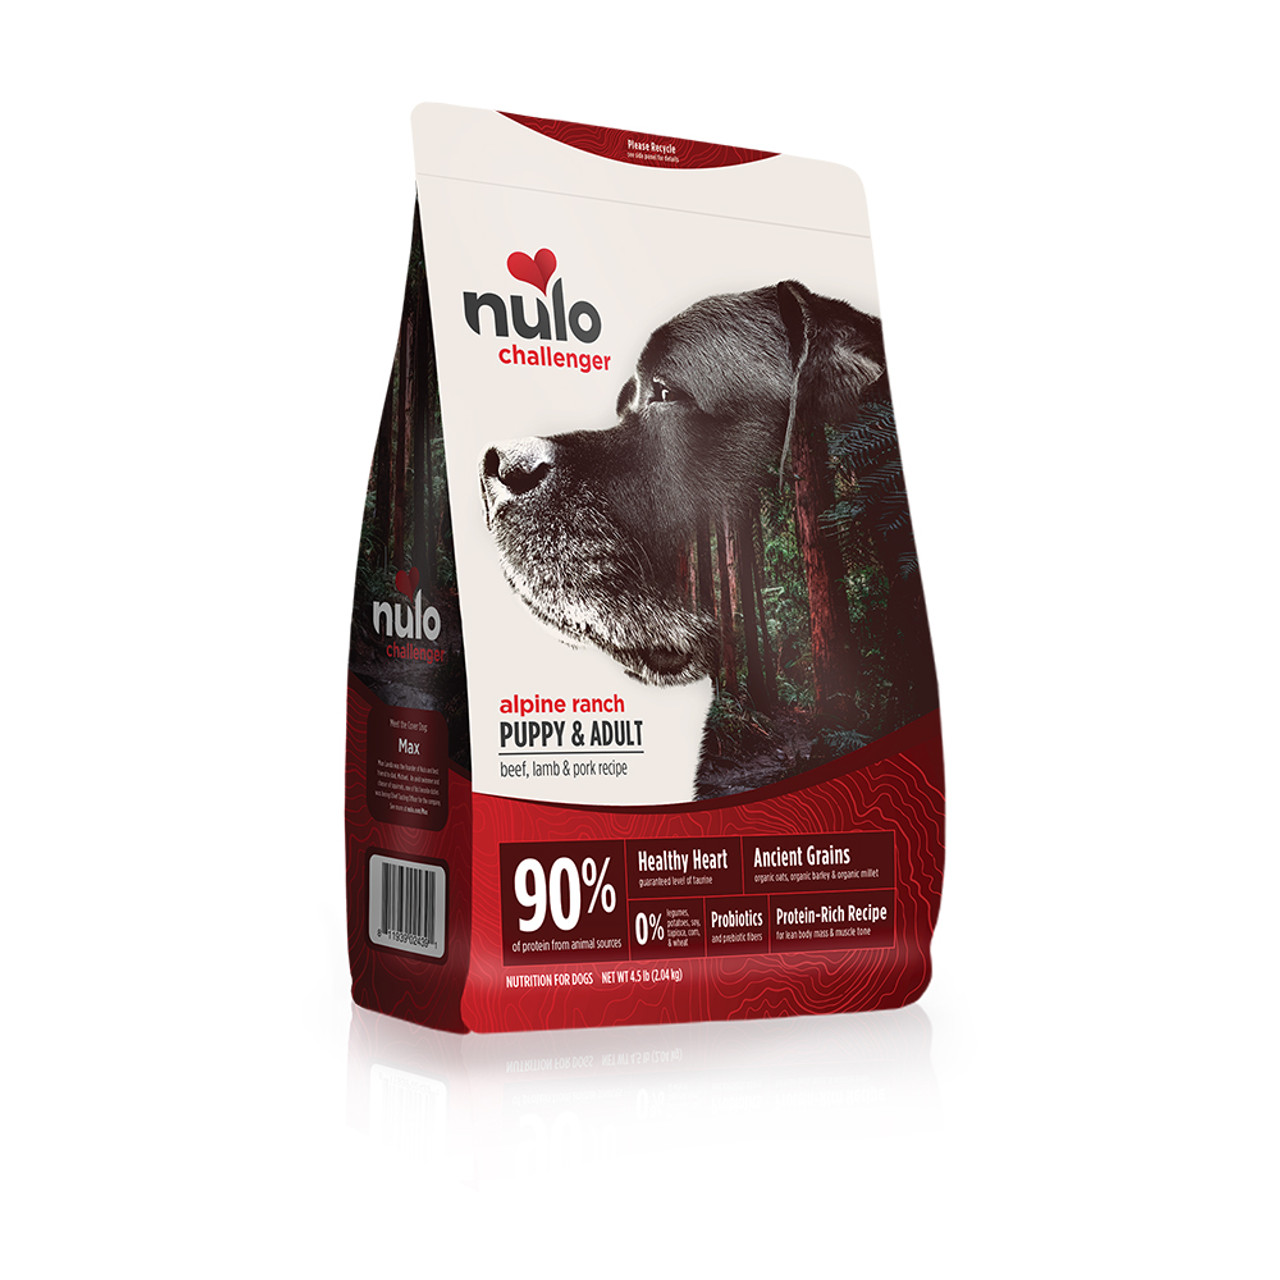 Nulo Challenger Puppy & Adult Beef, Lamb & Pork Recipe Dry Dog Food - 4.5 lb